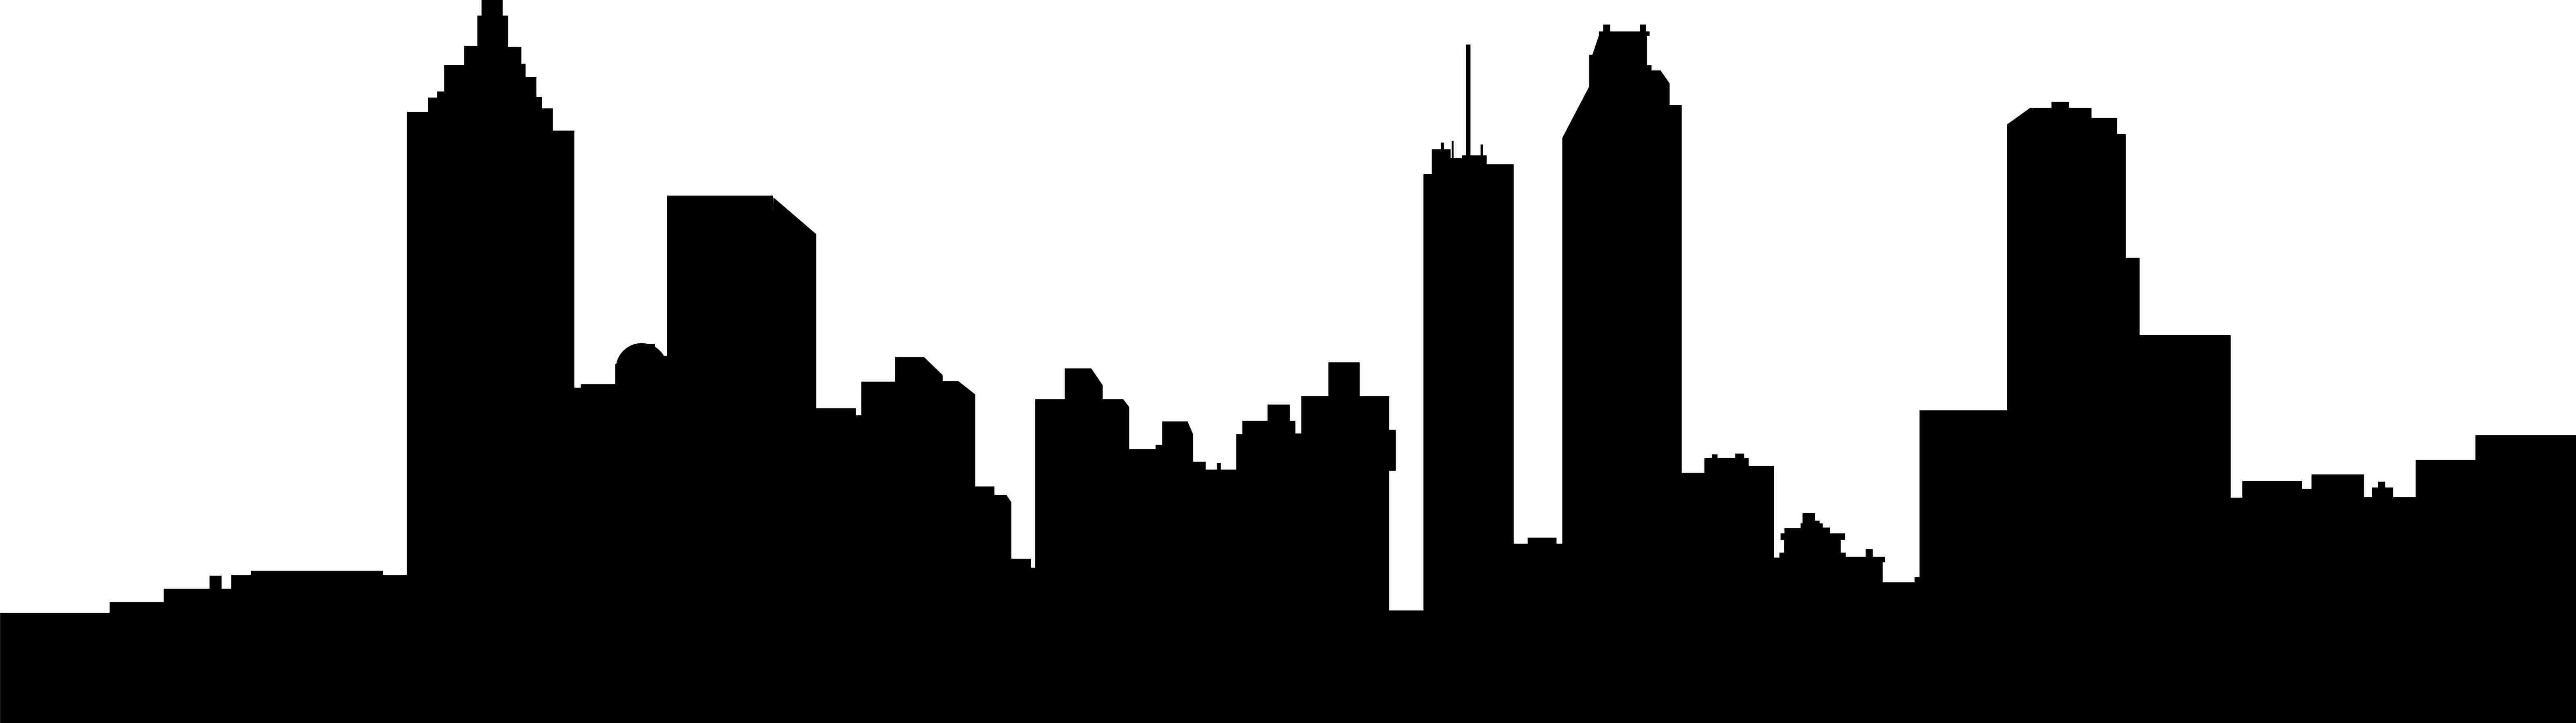 6367x1786 Atlanta Skyline Vector Image Group